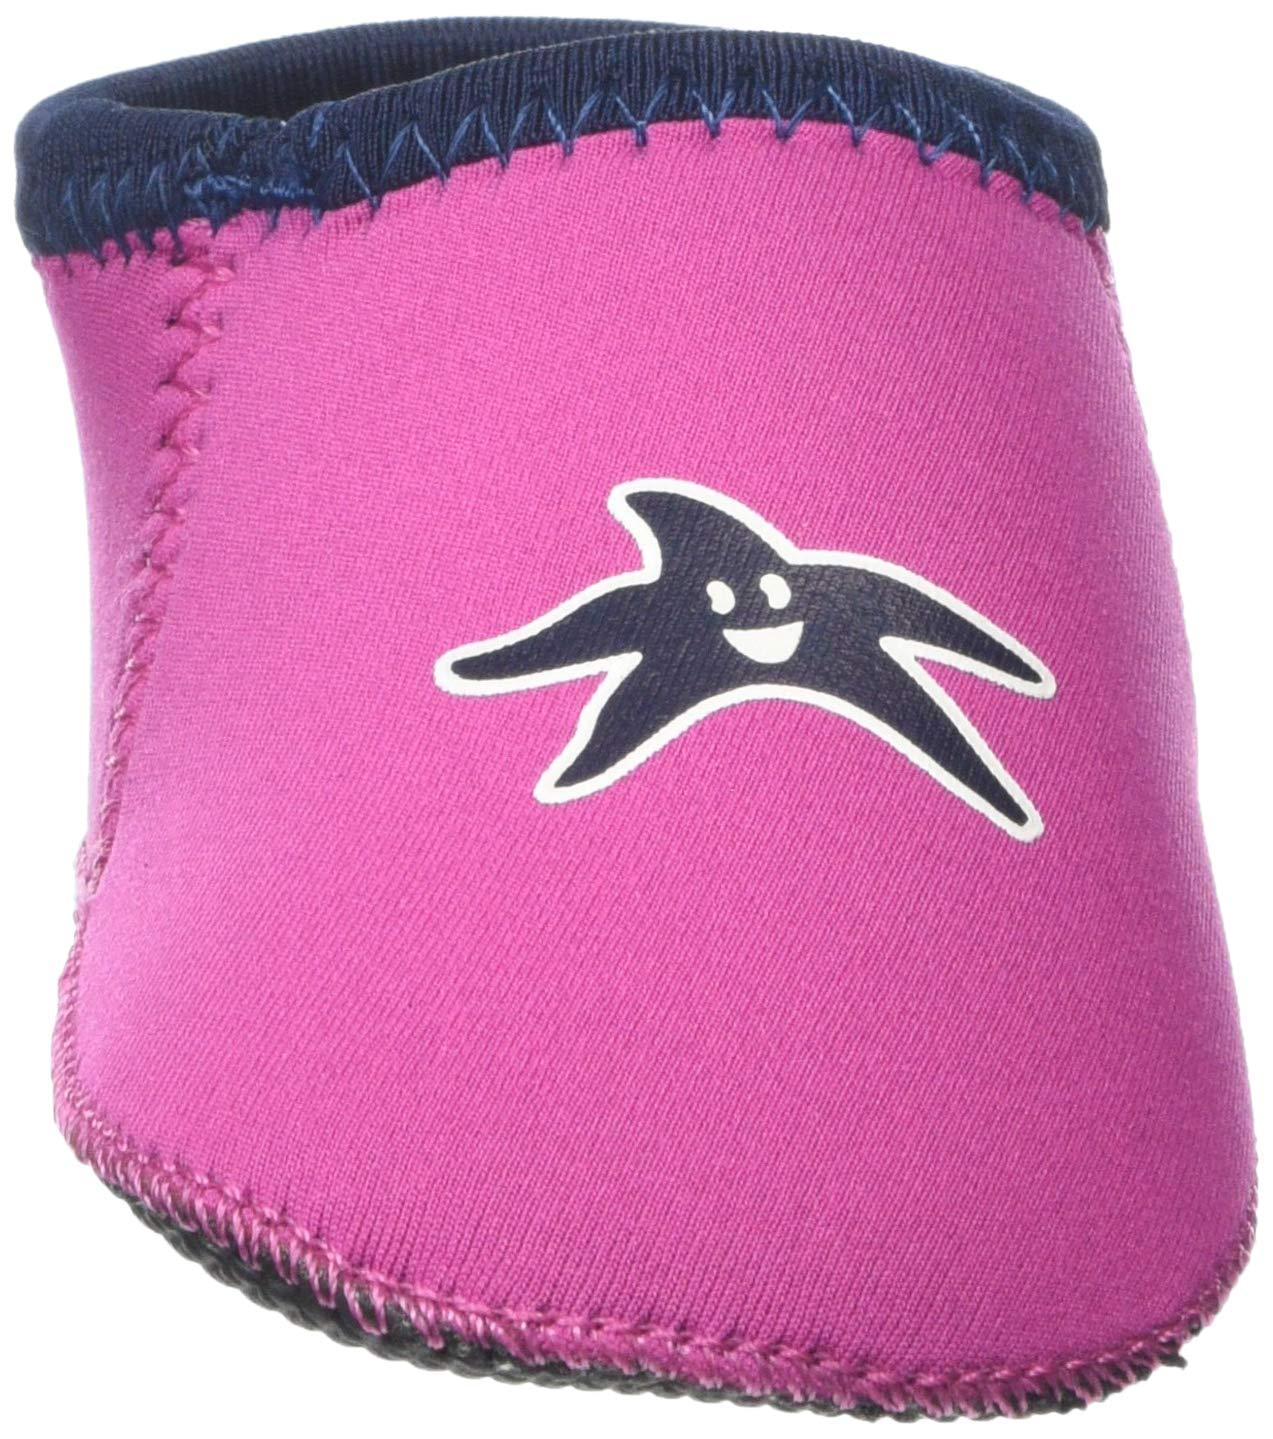 M Shore Feet Padder Shoes Pink 12-18 Months